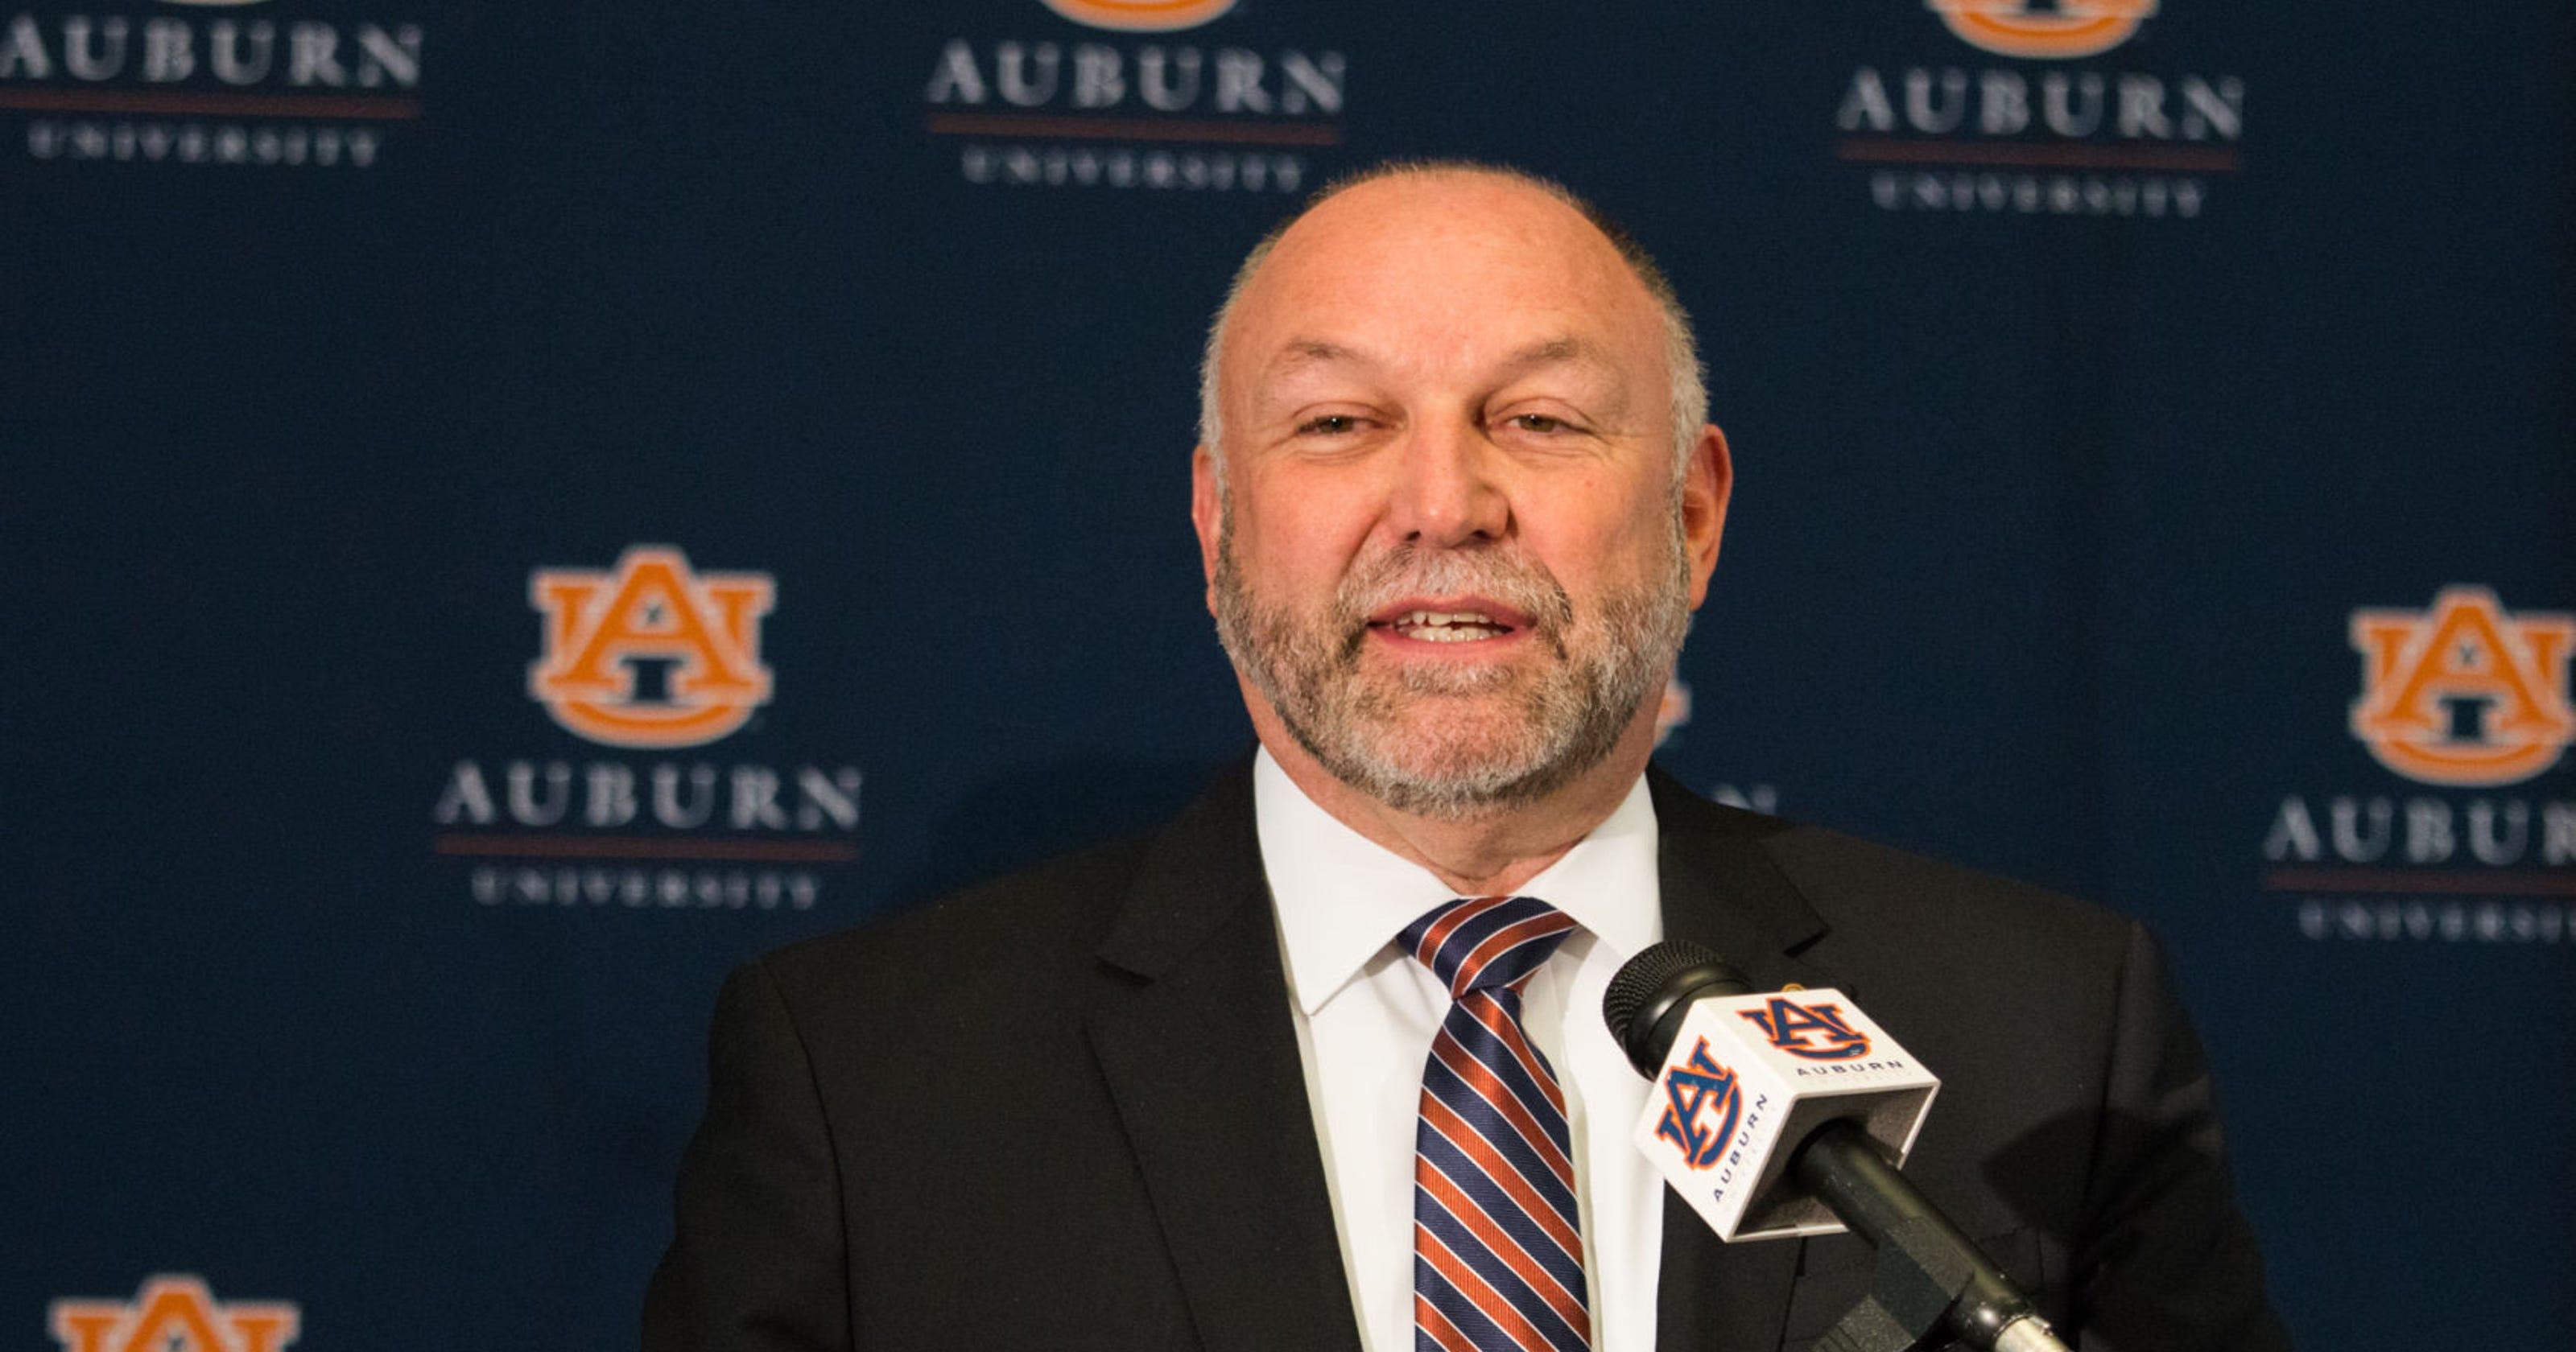 ISU vs  Auburn: Why did Leath choose Alabama over Iowa?